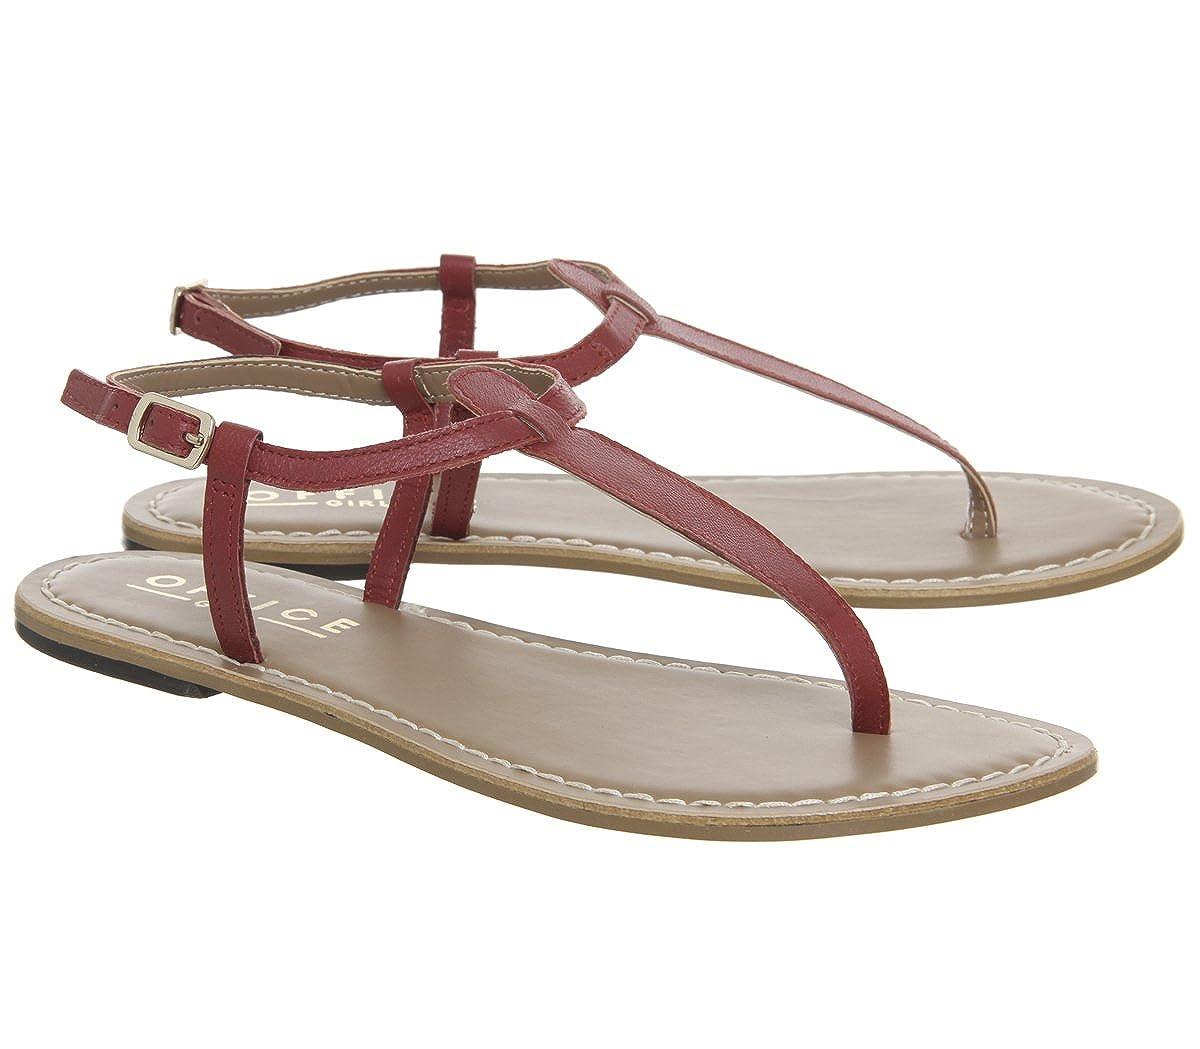 94636f936da7 Office Samba Toe Post Sandals  Amazon.co.uk  Shoes   Bags